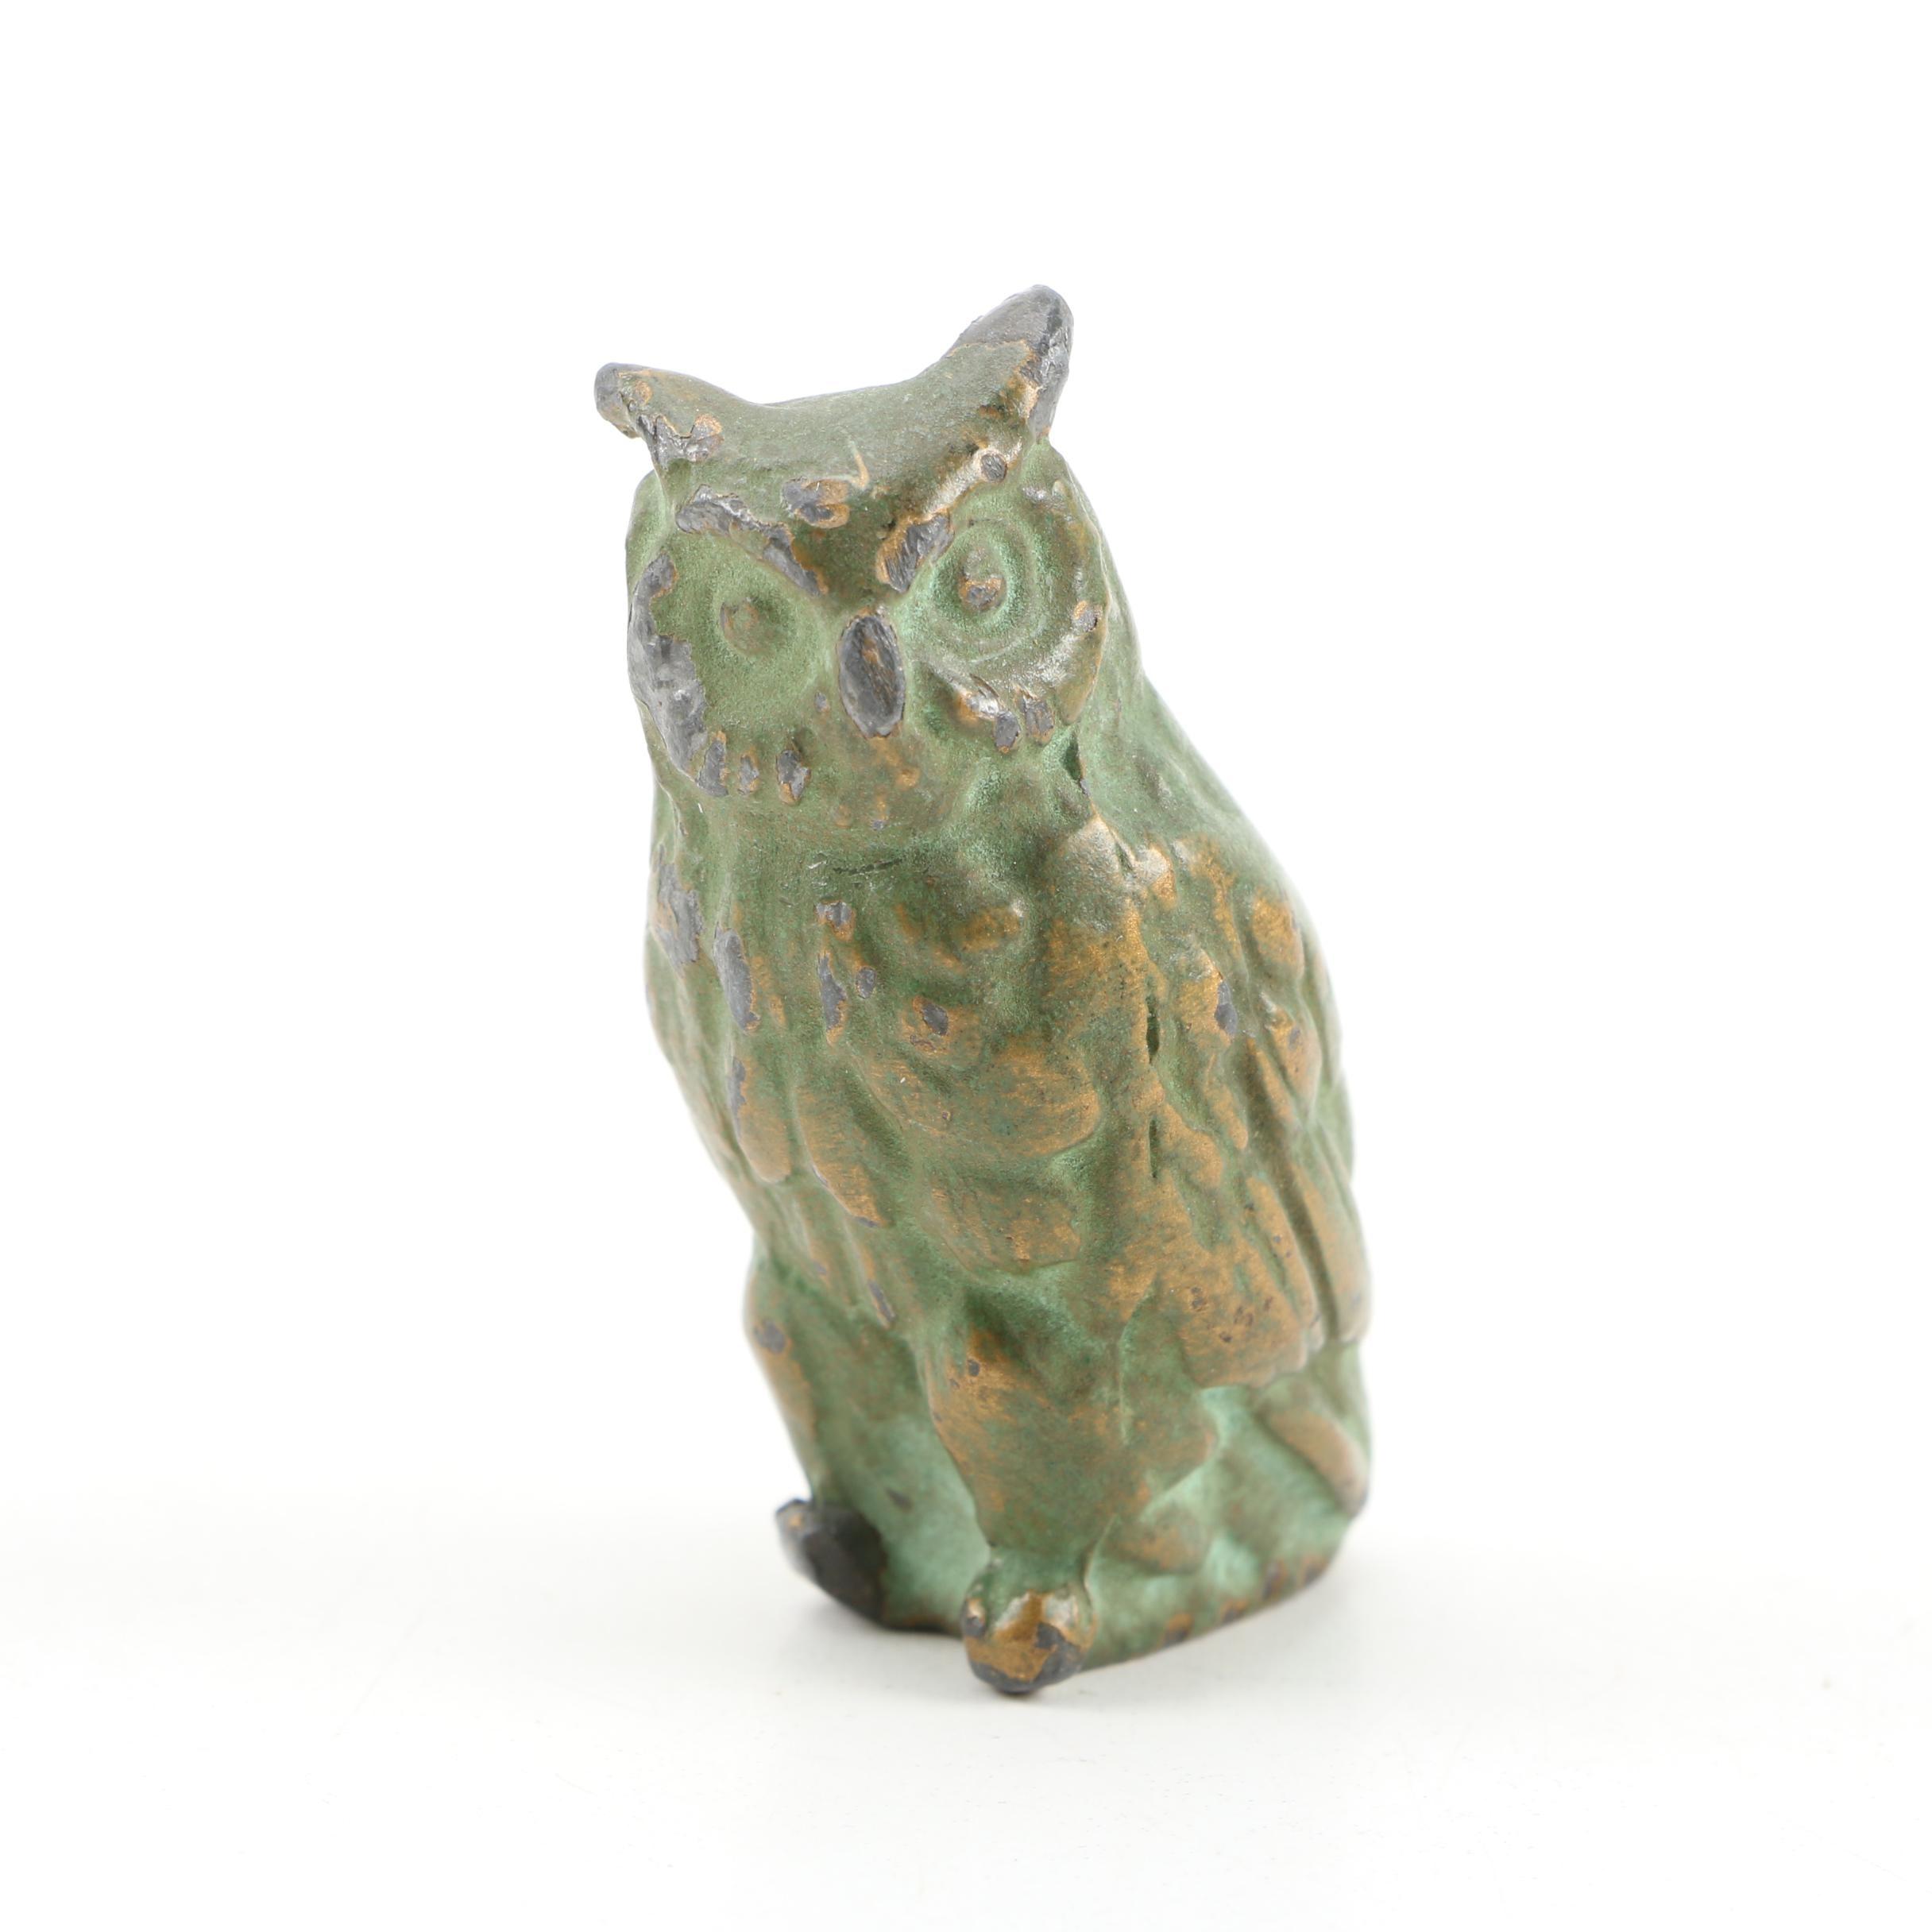 Patinated Brass Finish Cast Metal Owl Figurine